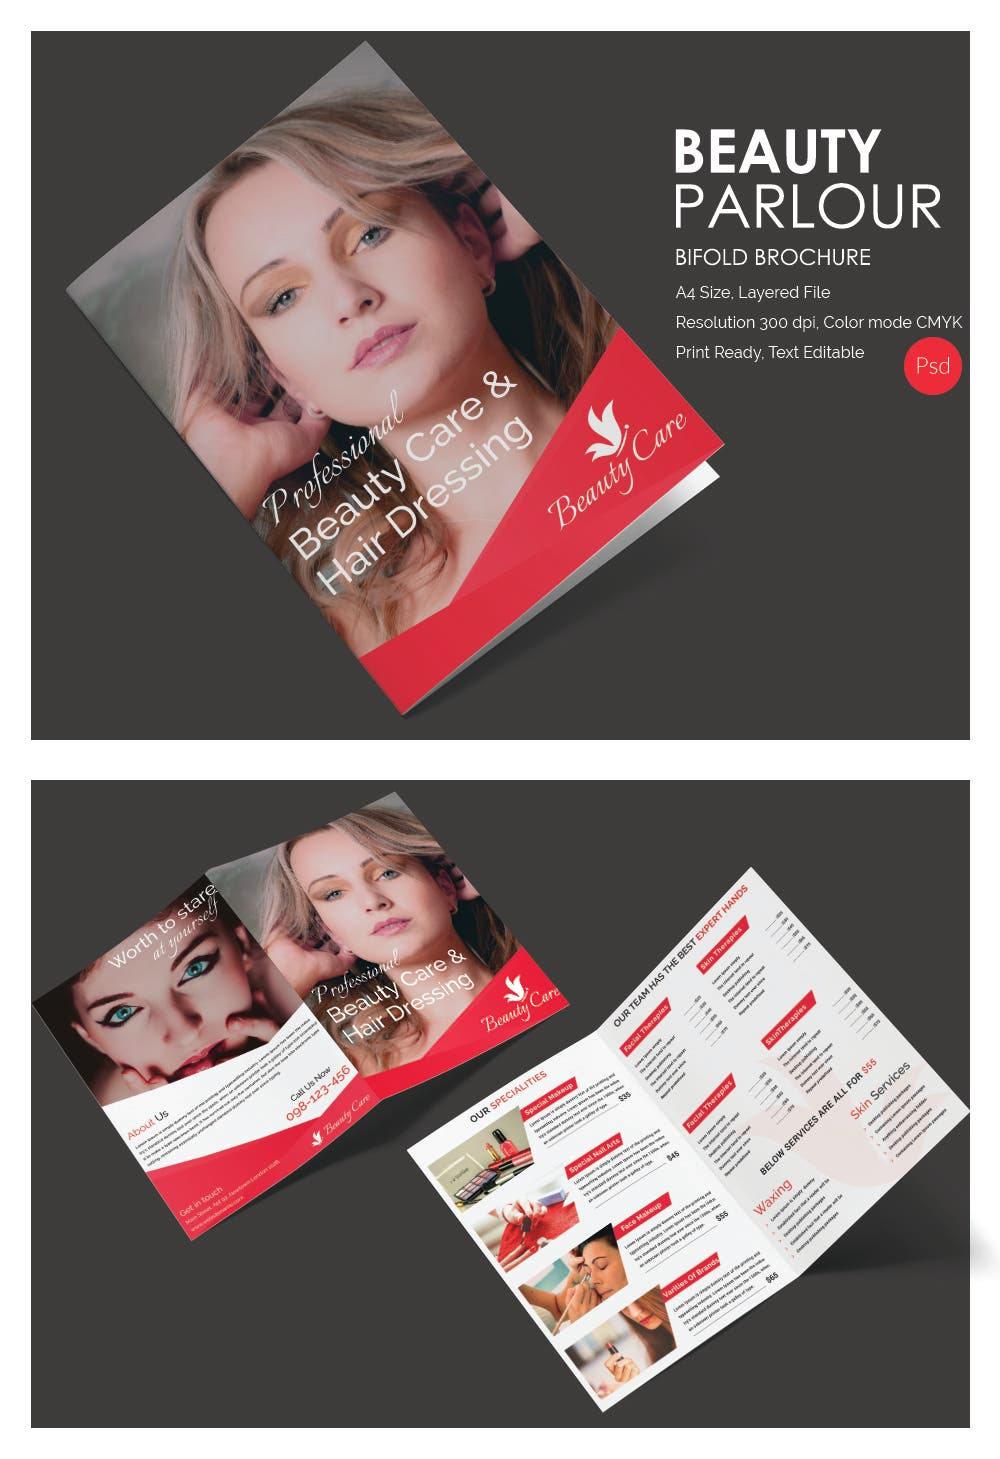 Beauty parlor templates joy studio design gallery - best design